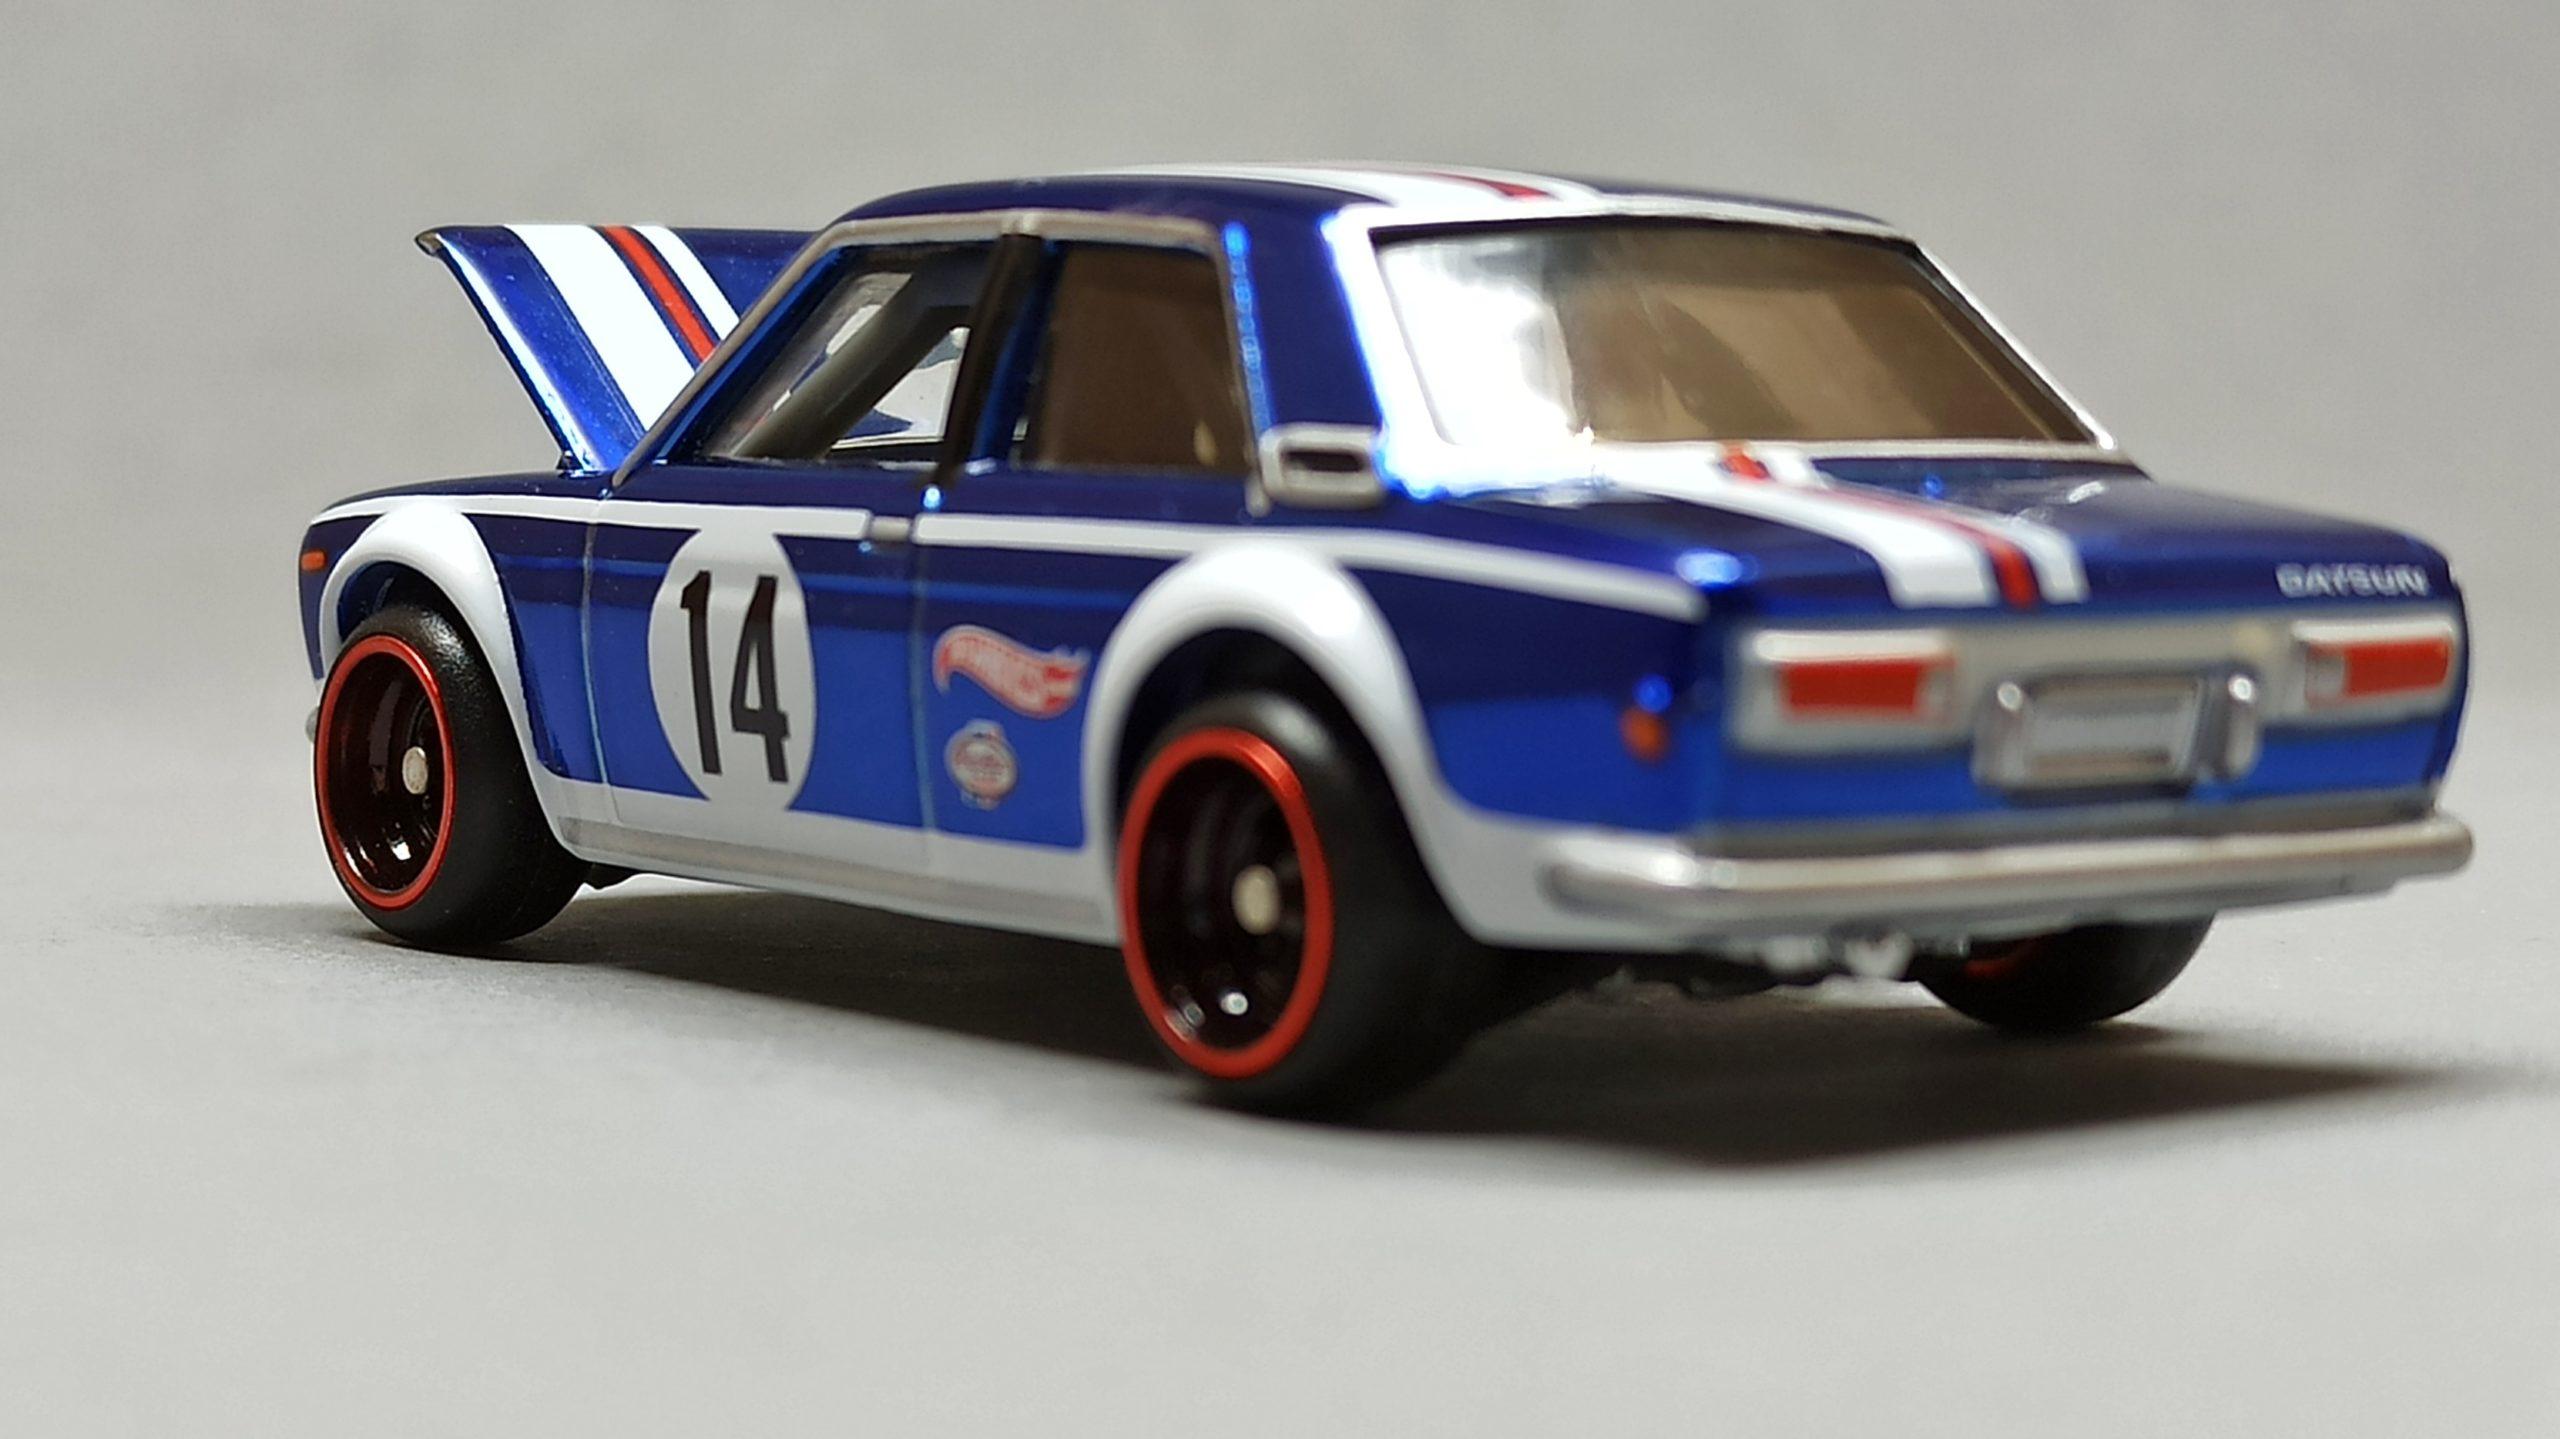 Hot Wheels Datsun Bluebird 510 (DTH31) 2016 RLC HWC Series 14 Real Riders (3/4) (1 of 7.000) spectraflame blue side angle open hood